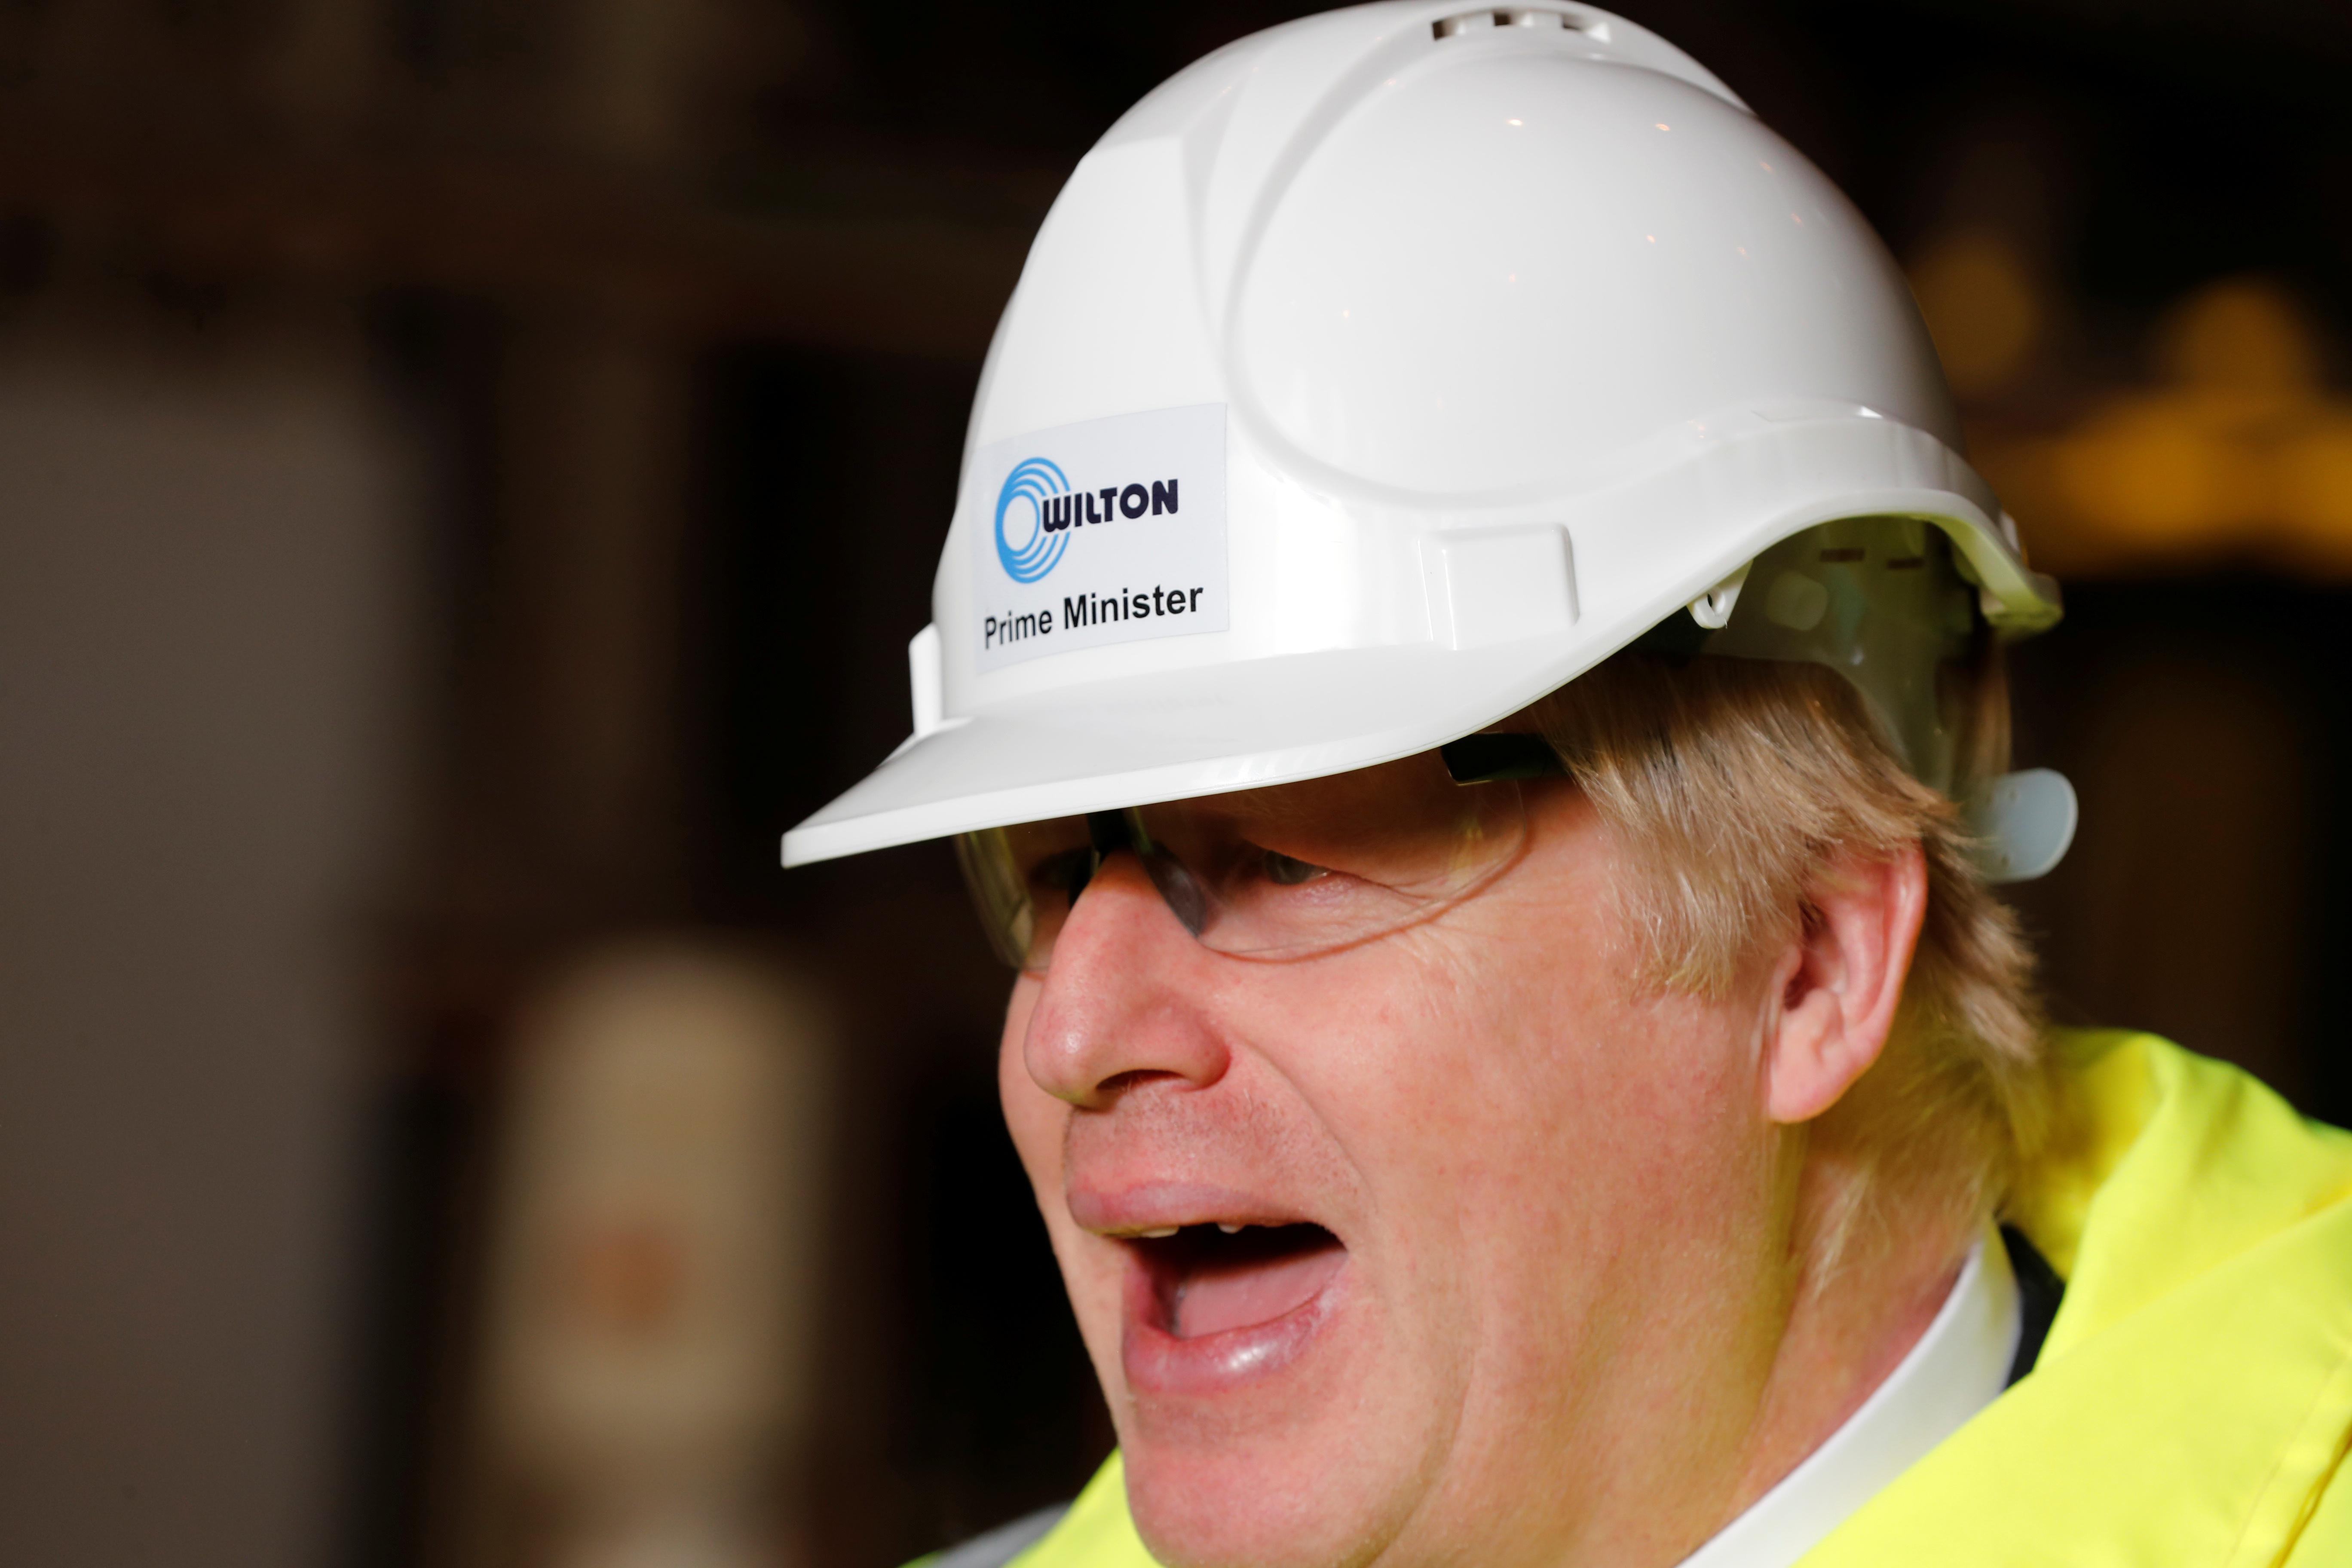 UK's Johnson raises prospect of multi-billion pound payroll tax cut